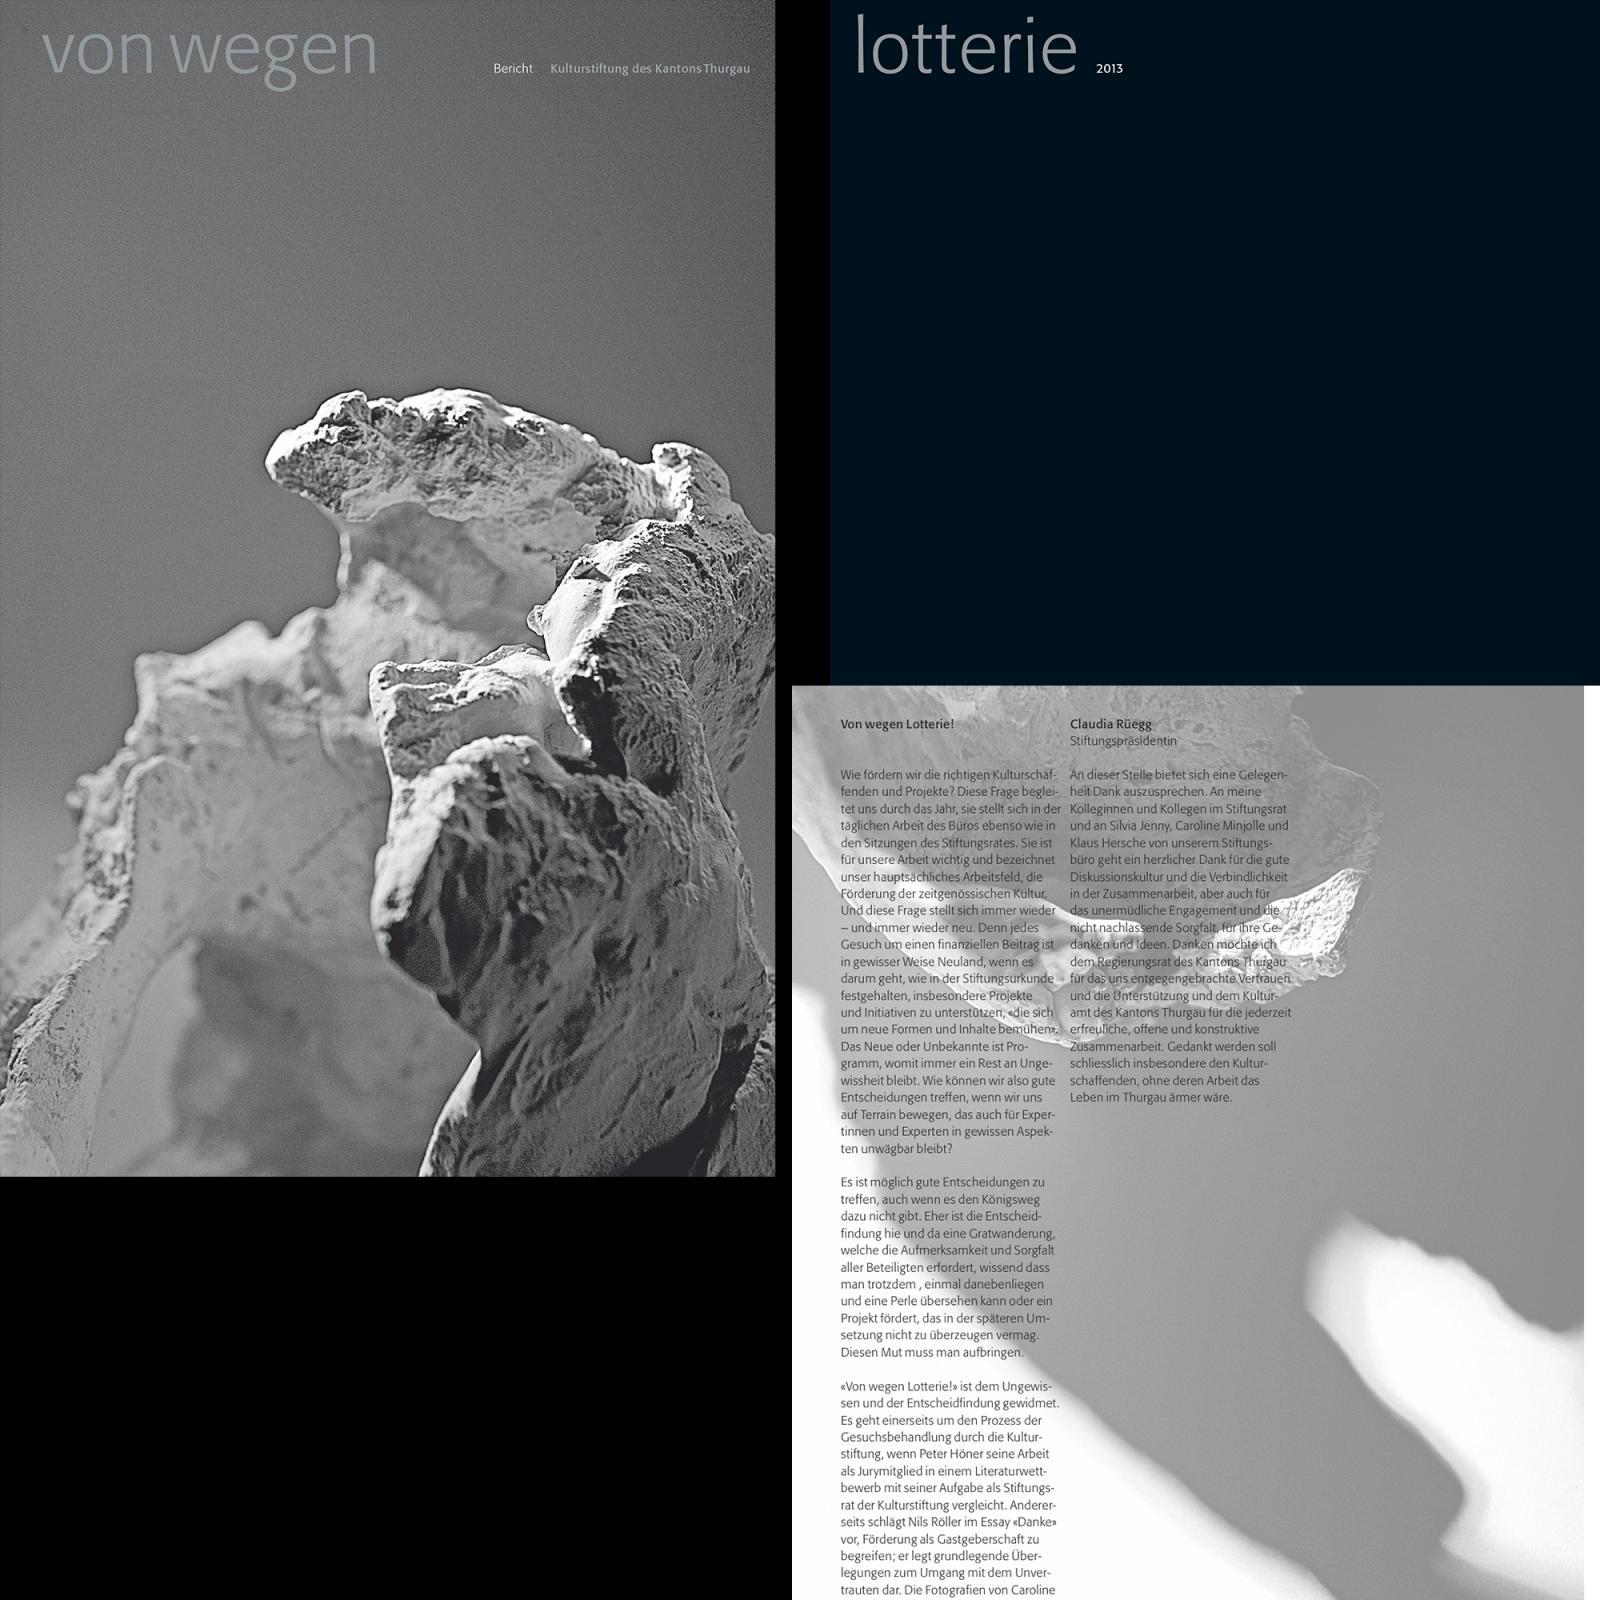 Kulturstiftung des Kantons Thurgau, Bericht 2013